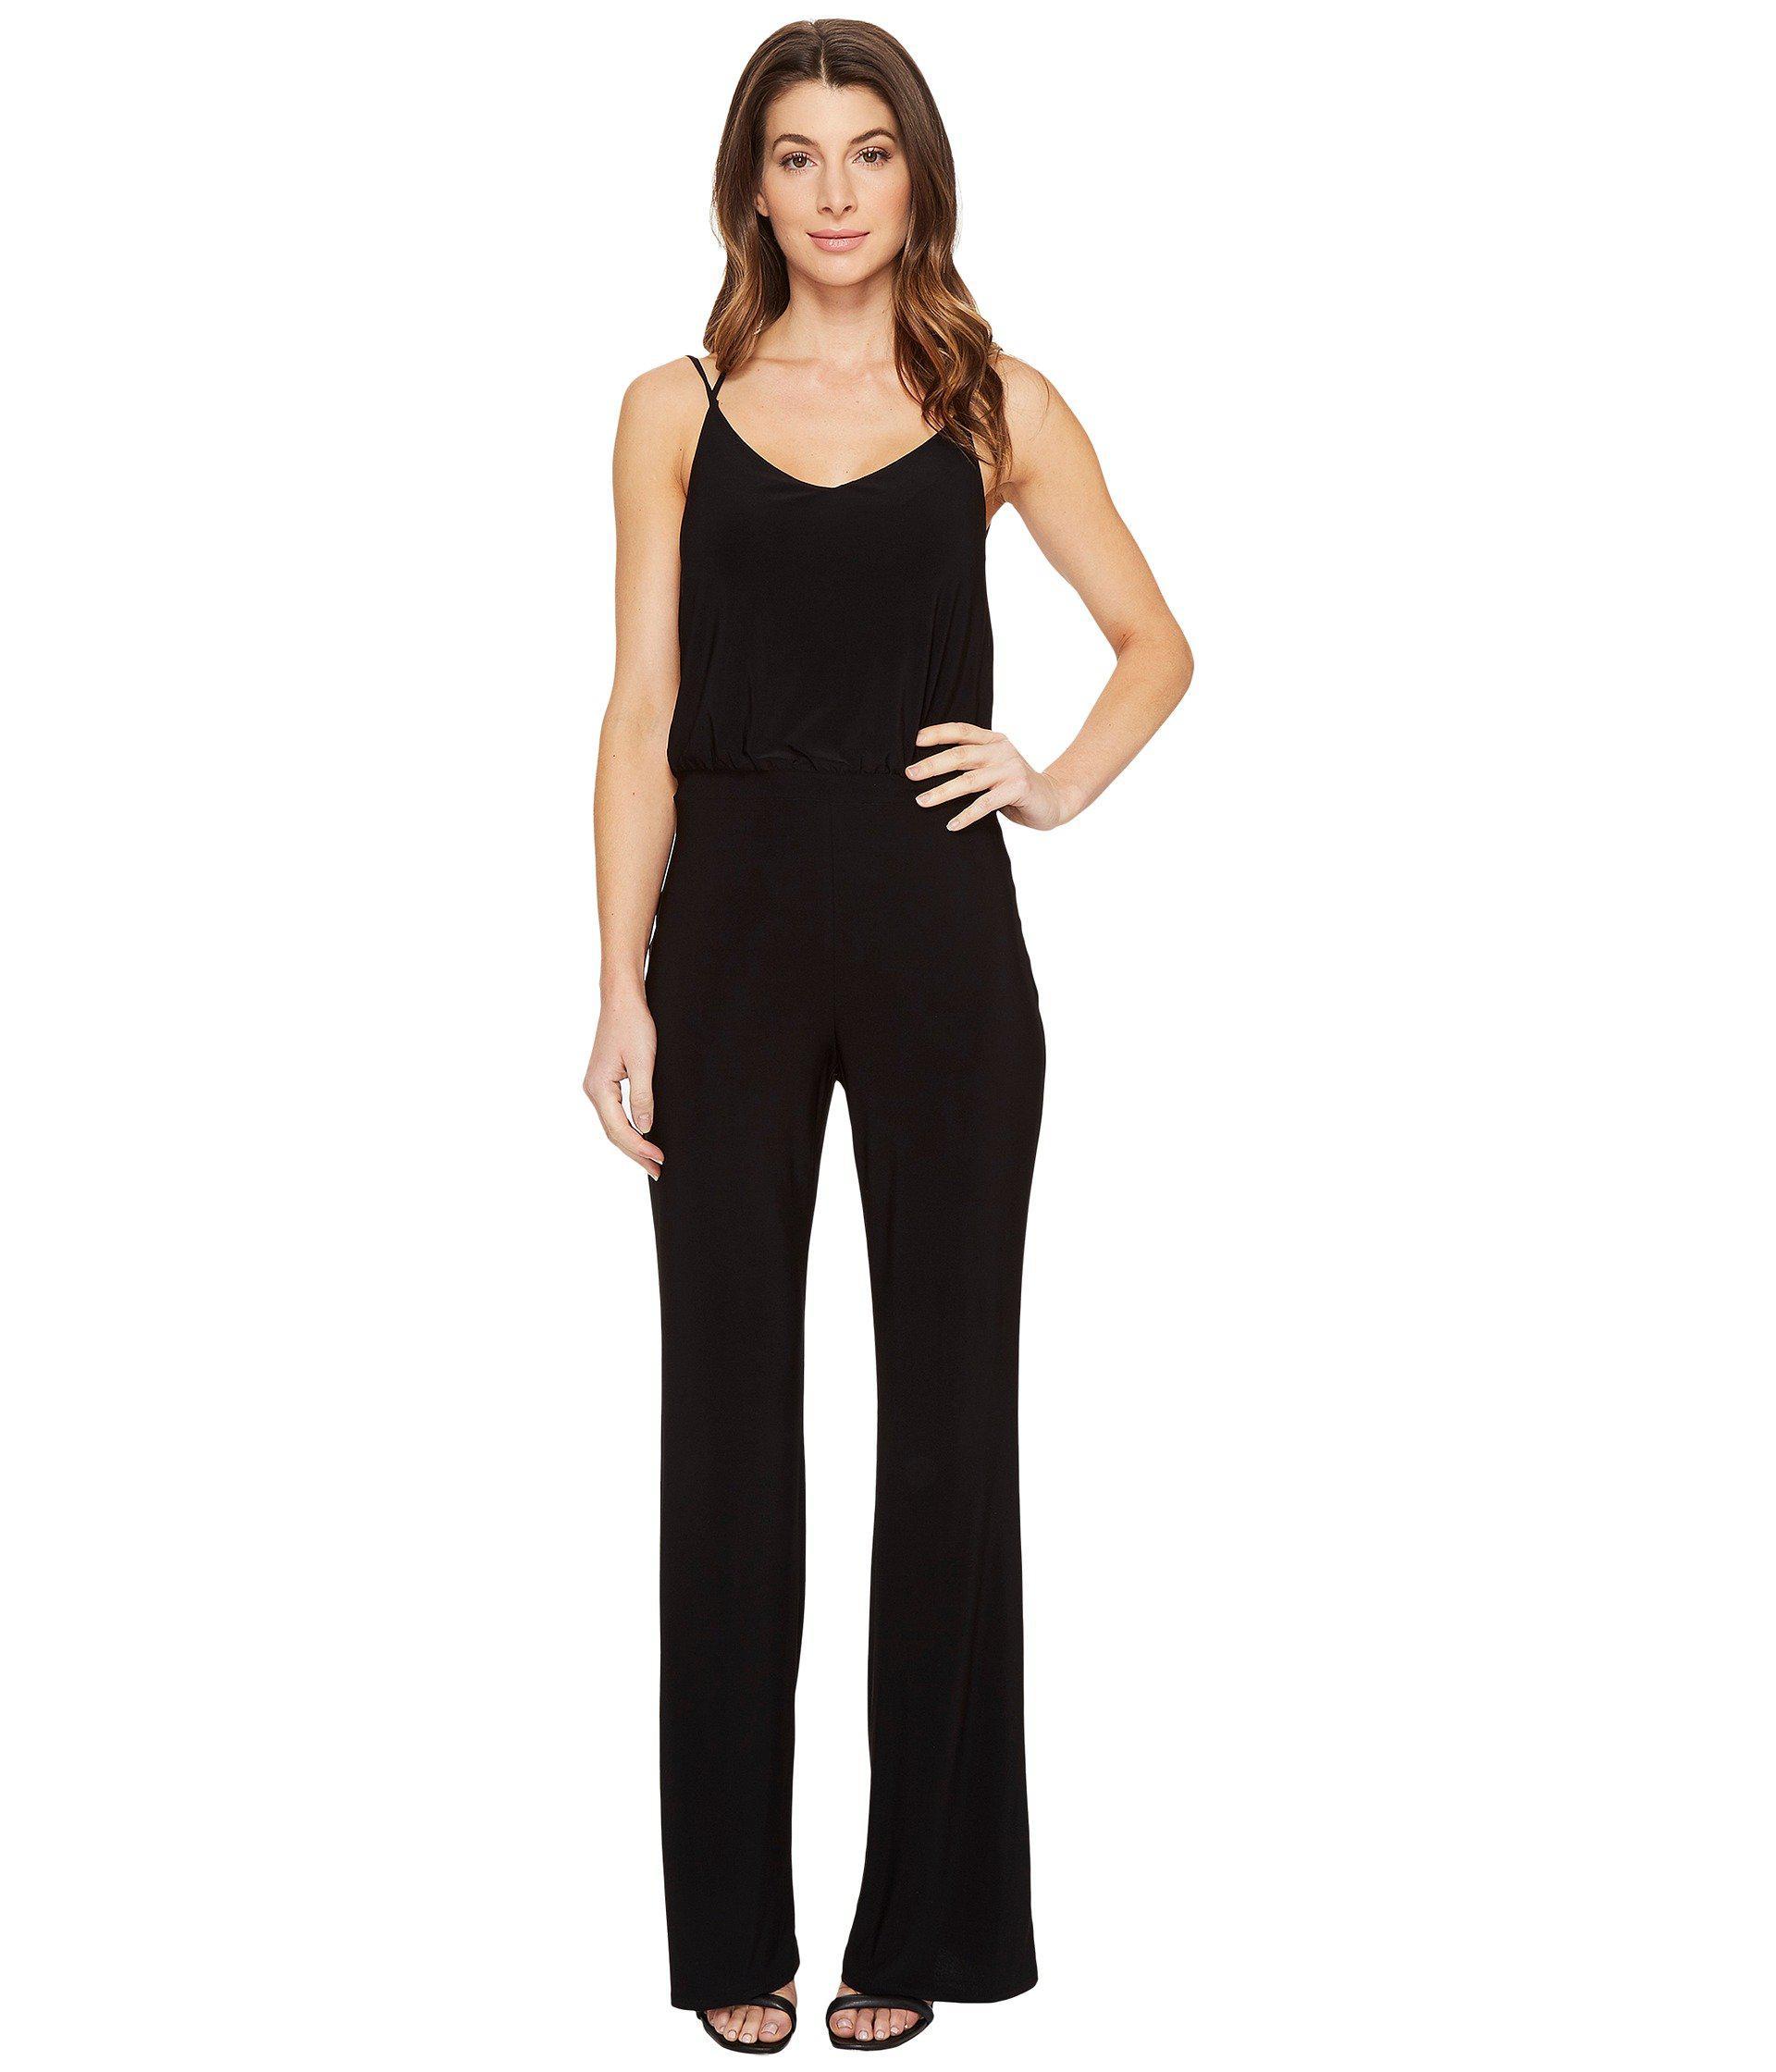 7a2dbaef490b1 Lyst - Laundry by Shelli Segal Cross-back Jumpsuit in Black